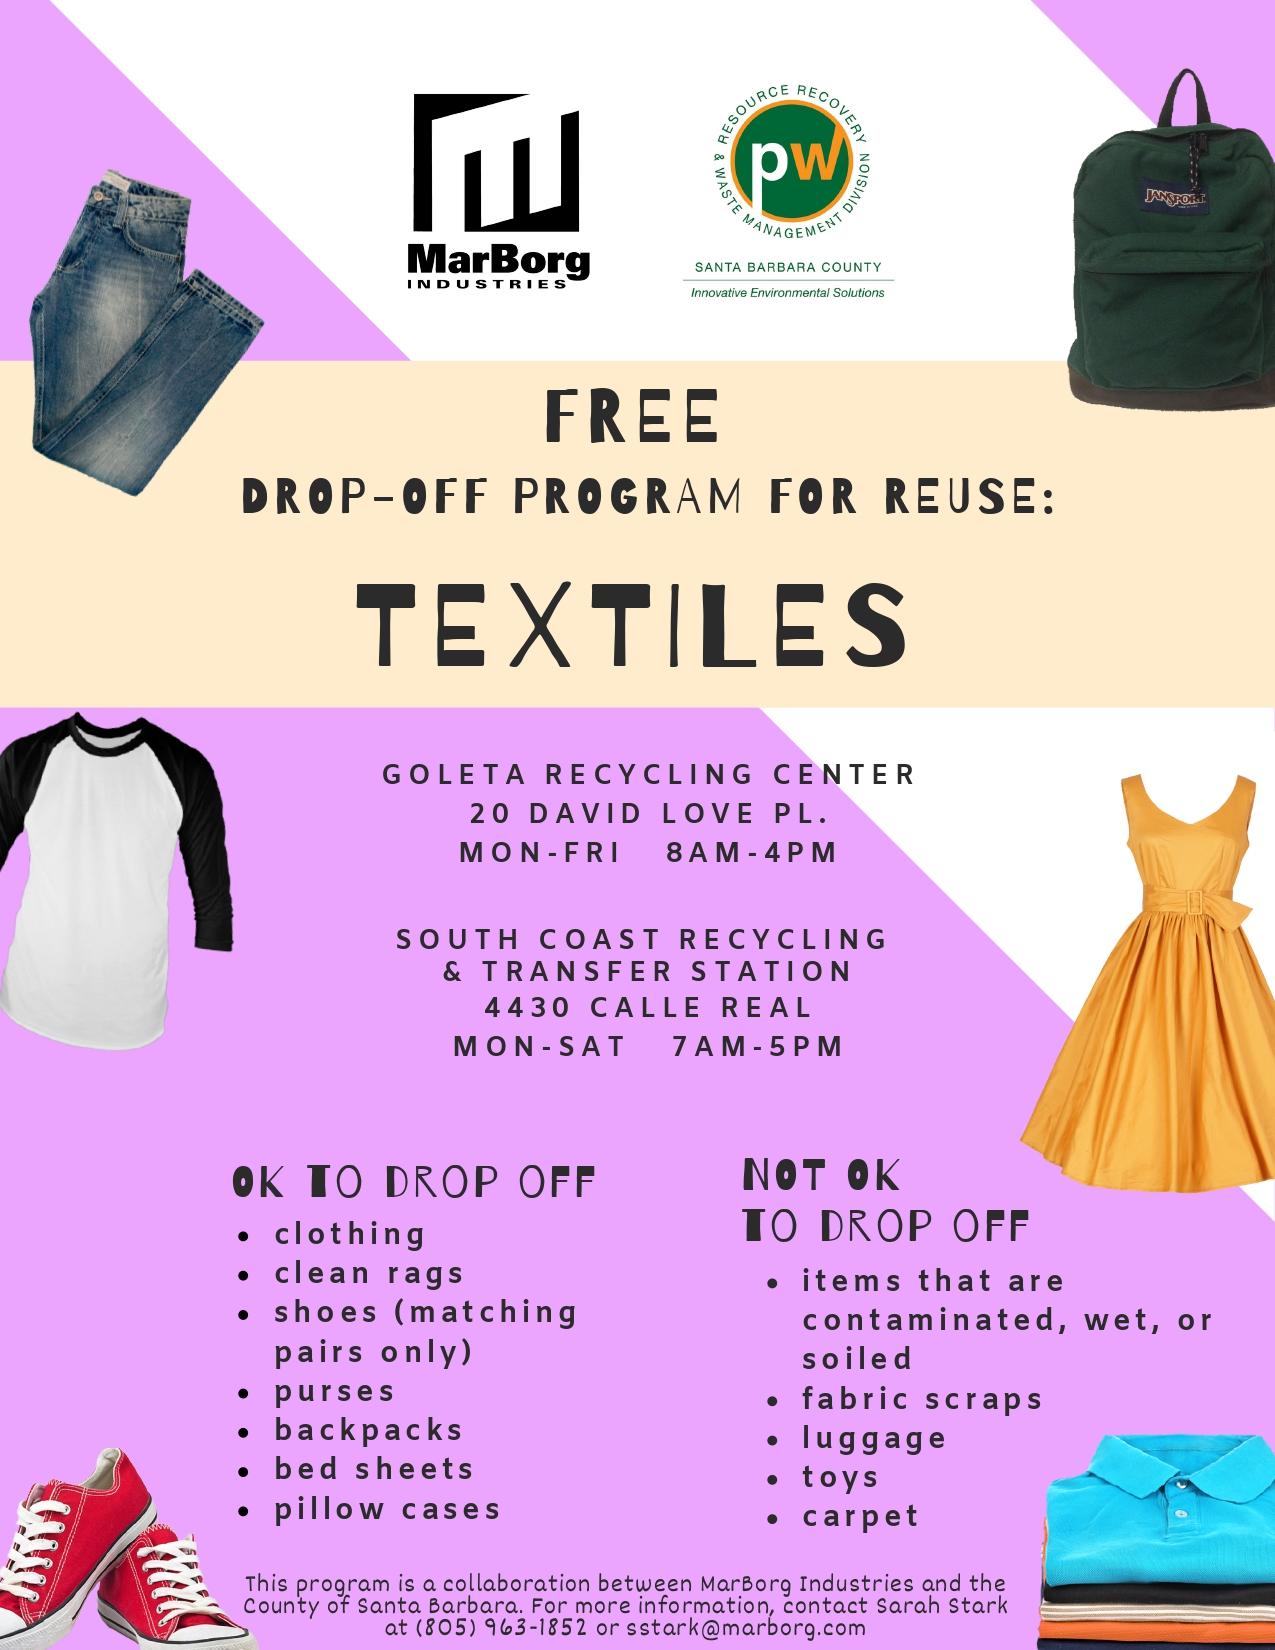 Textile Drop Off Information